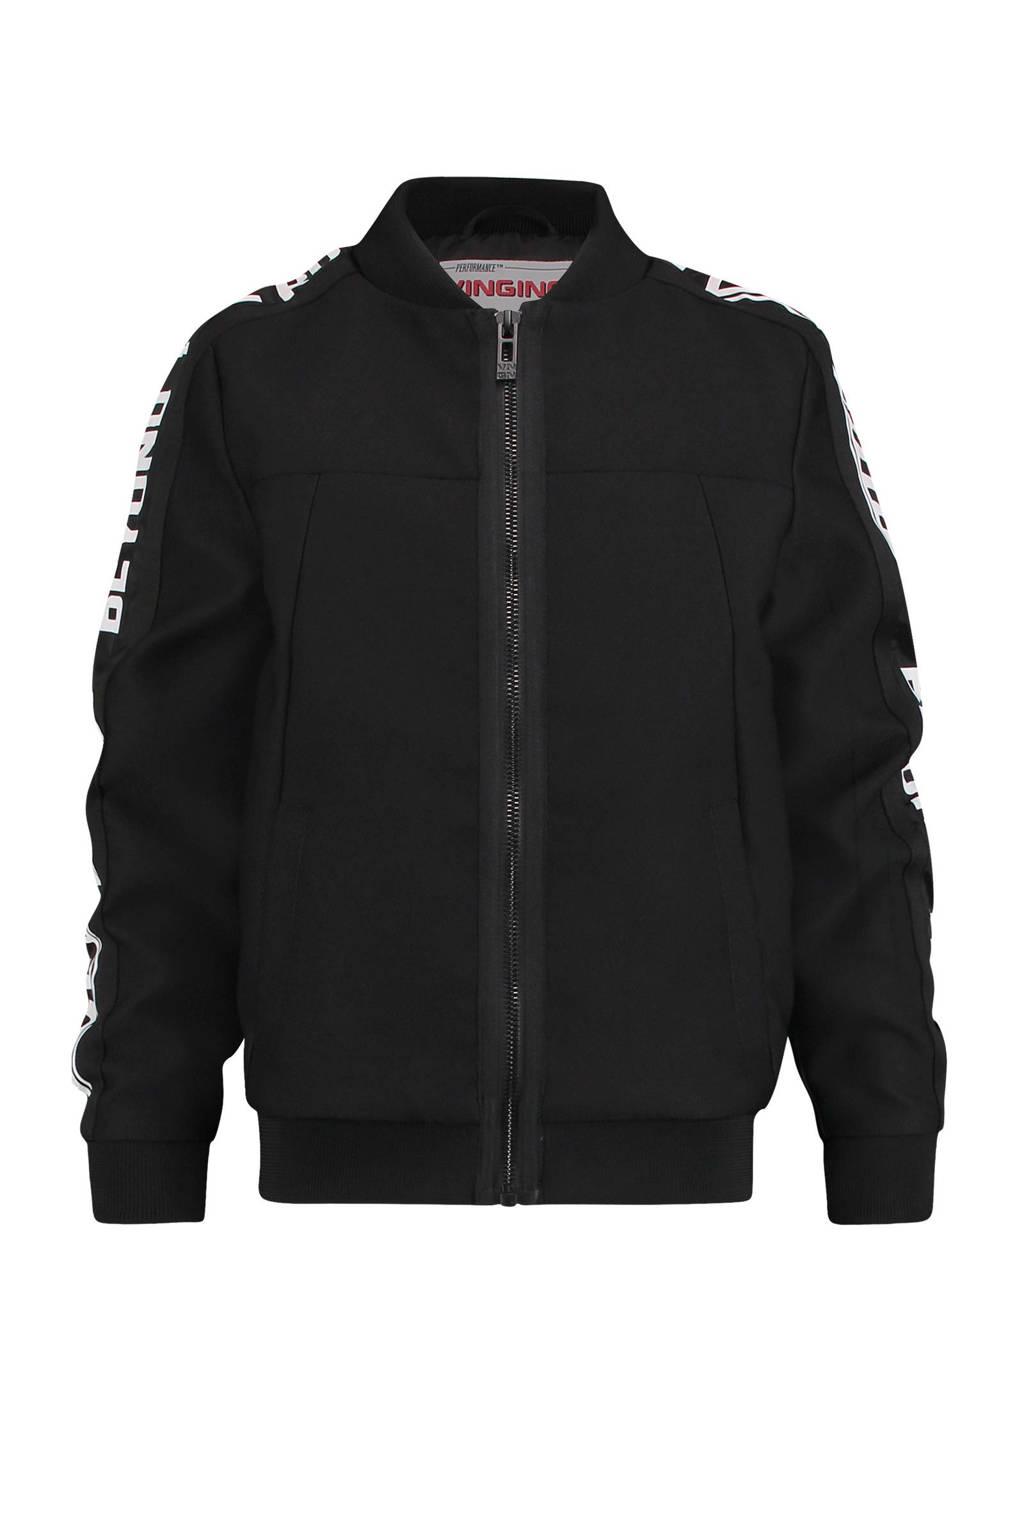 Vingino zomerjas Trom met tekst zwart, Zwart/wit